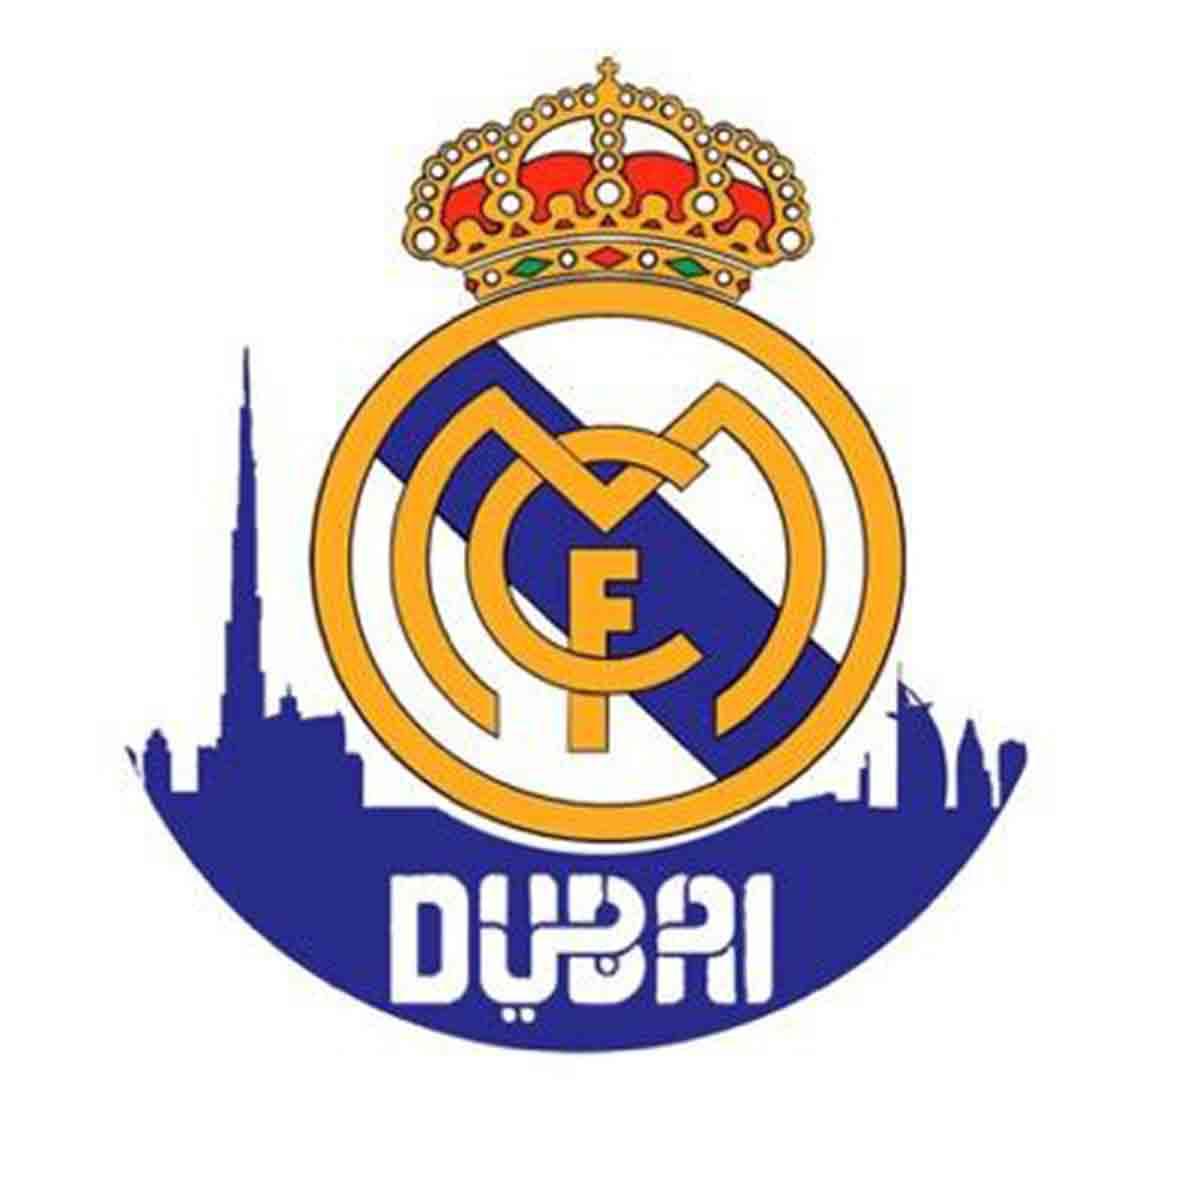 Logo peña Dubái